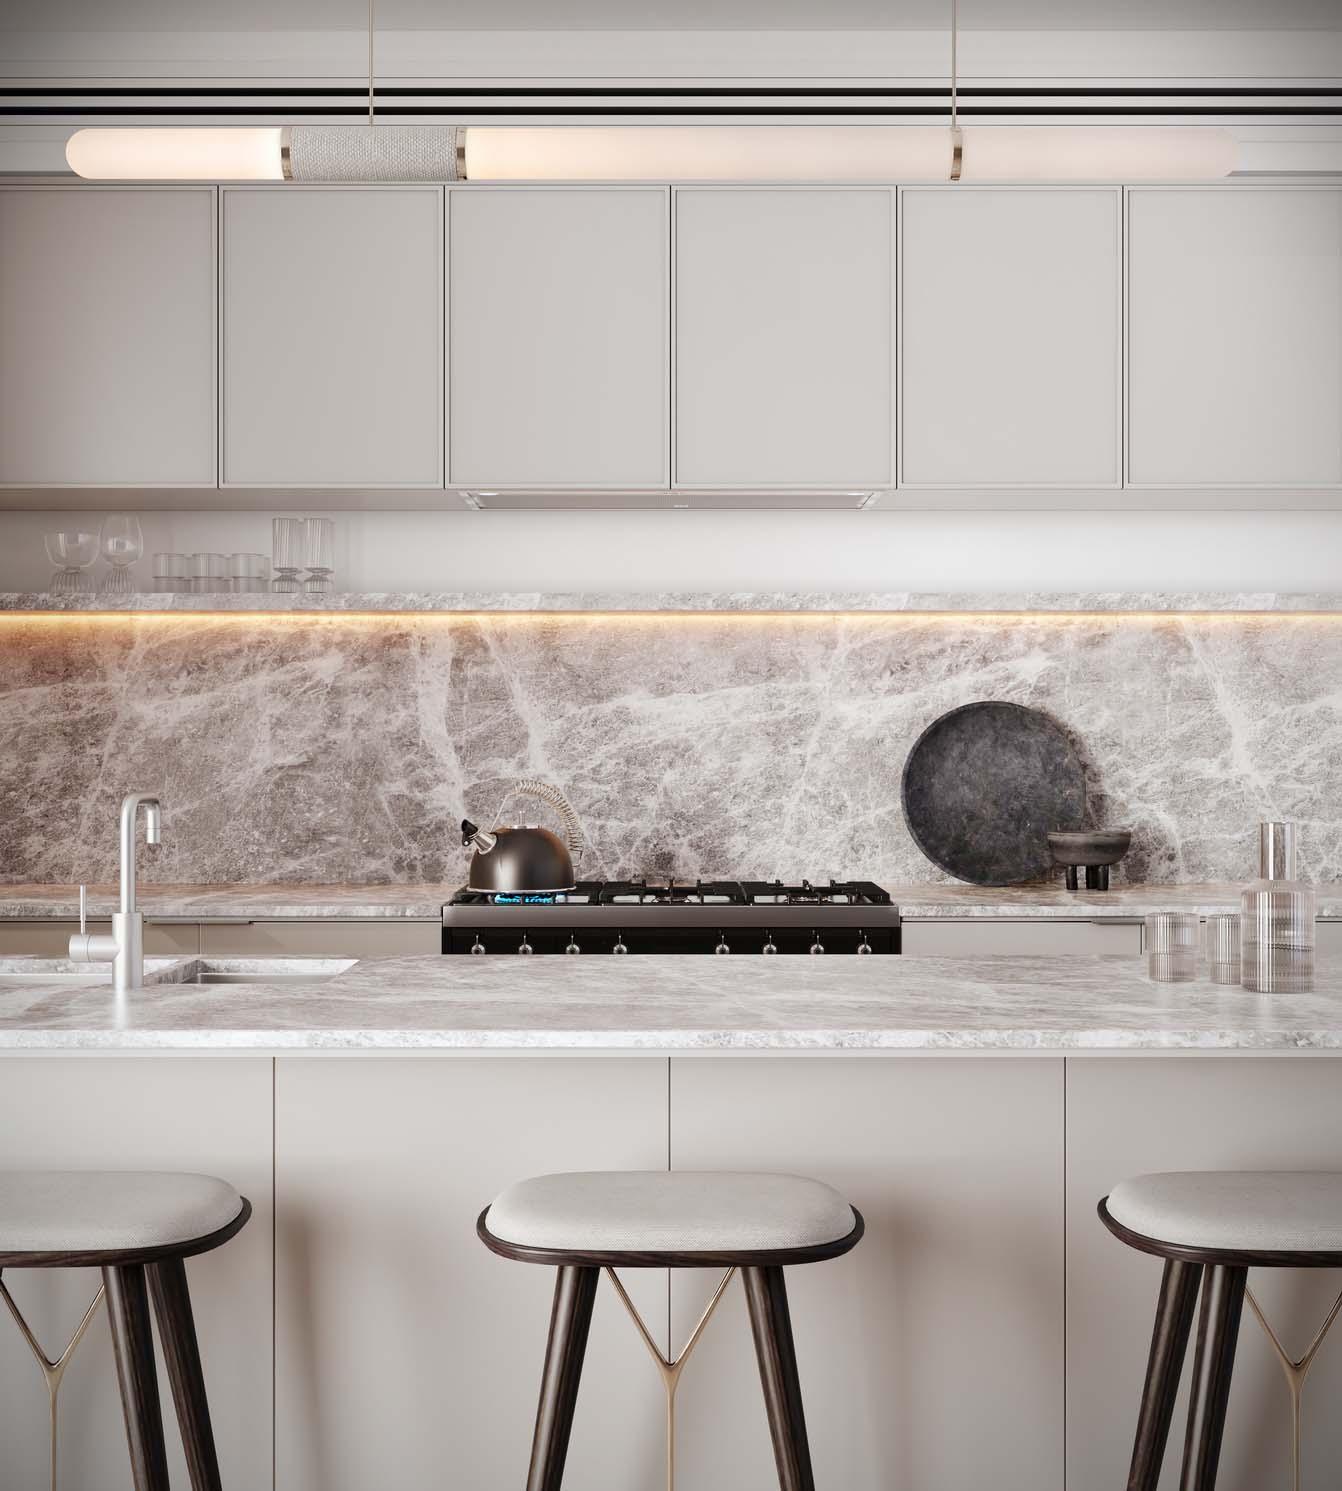 C&L-Residencies-Collingwood-3D-architectural-visualisation-bench-FKD-Studio